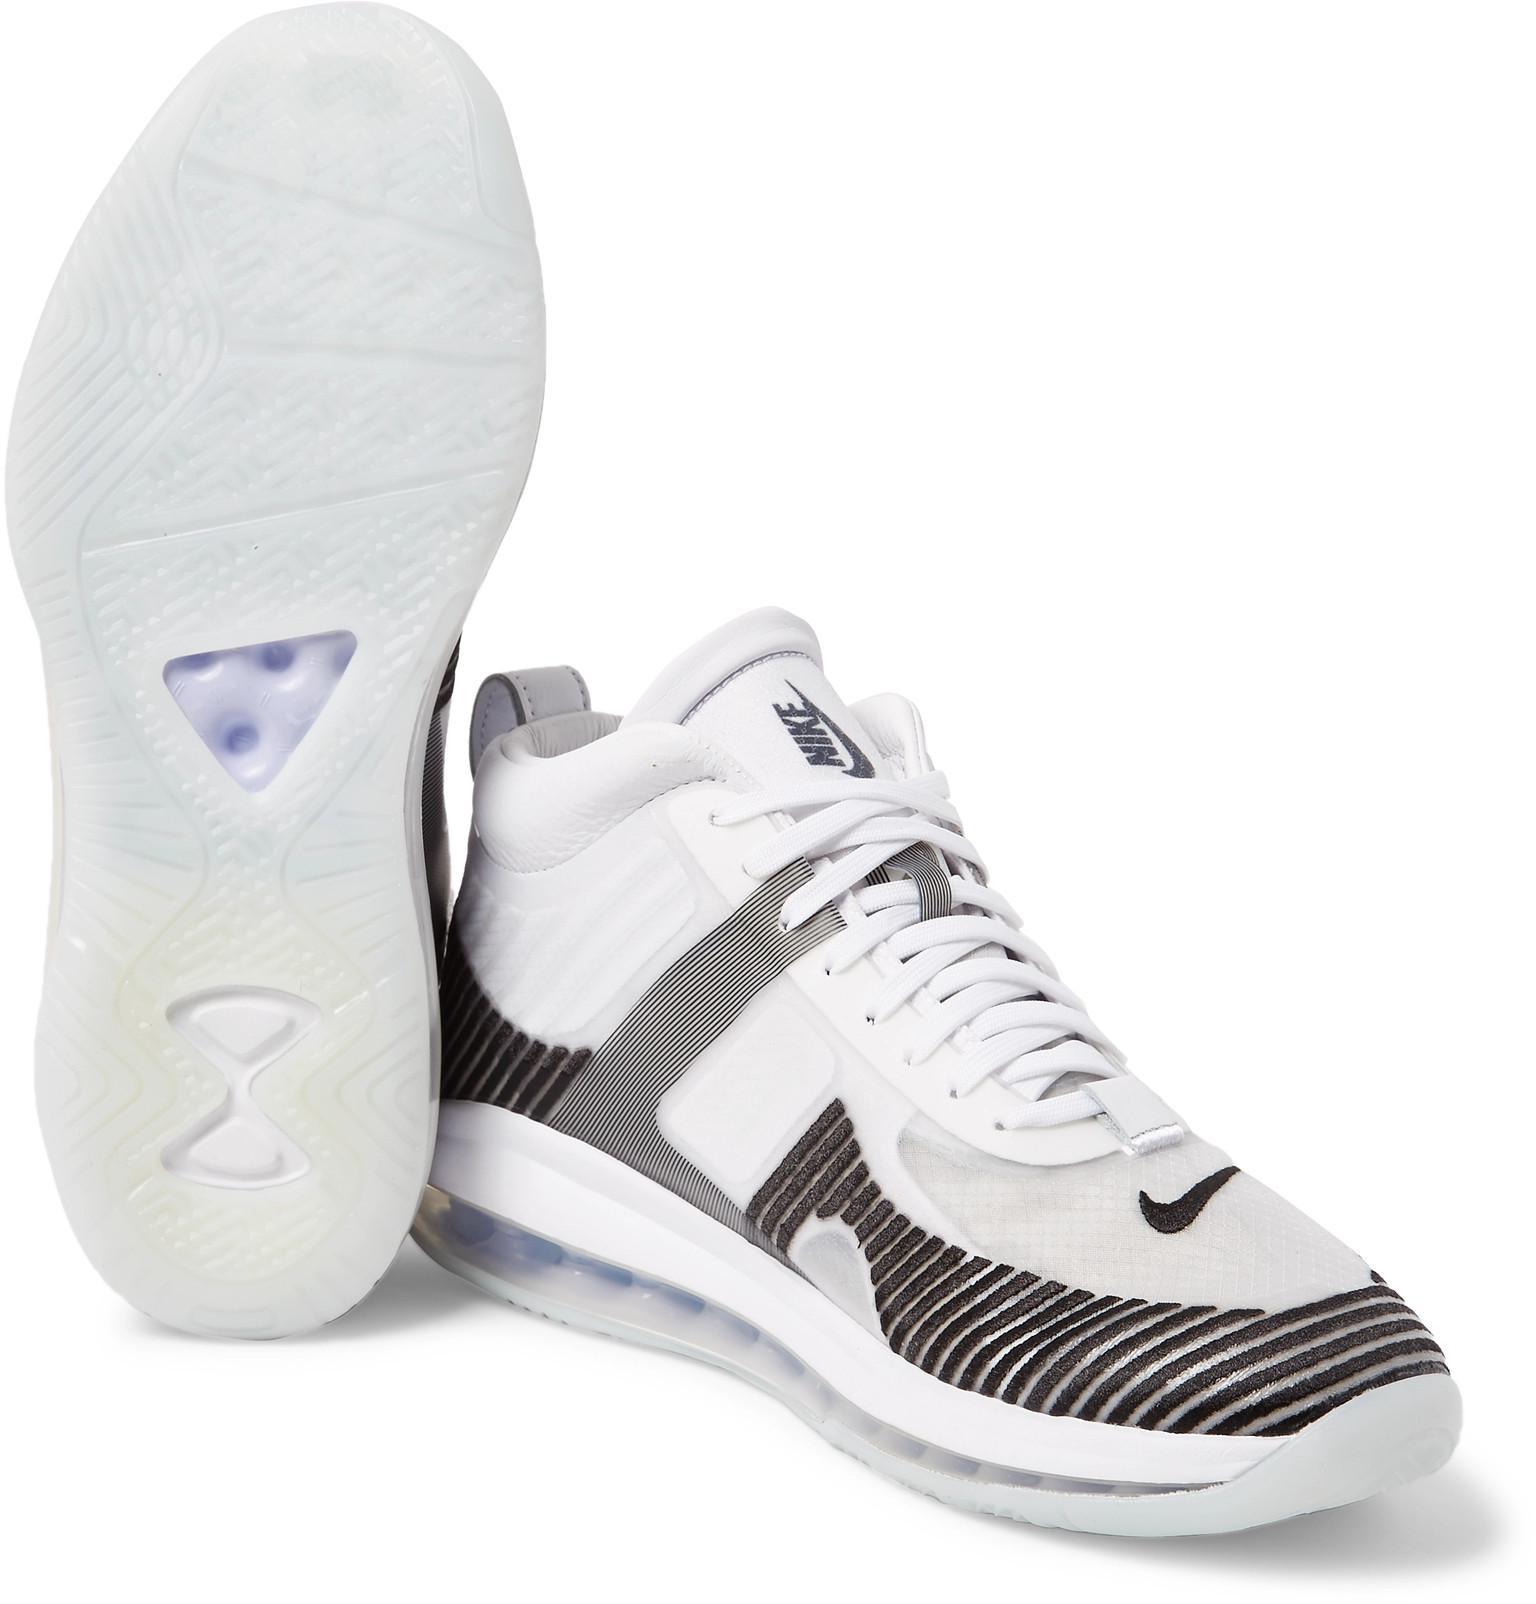 78eee6418bf Nike + Lebron James X John Elliott Icon Qs High-top Sneakers in ...